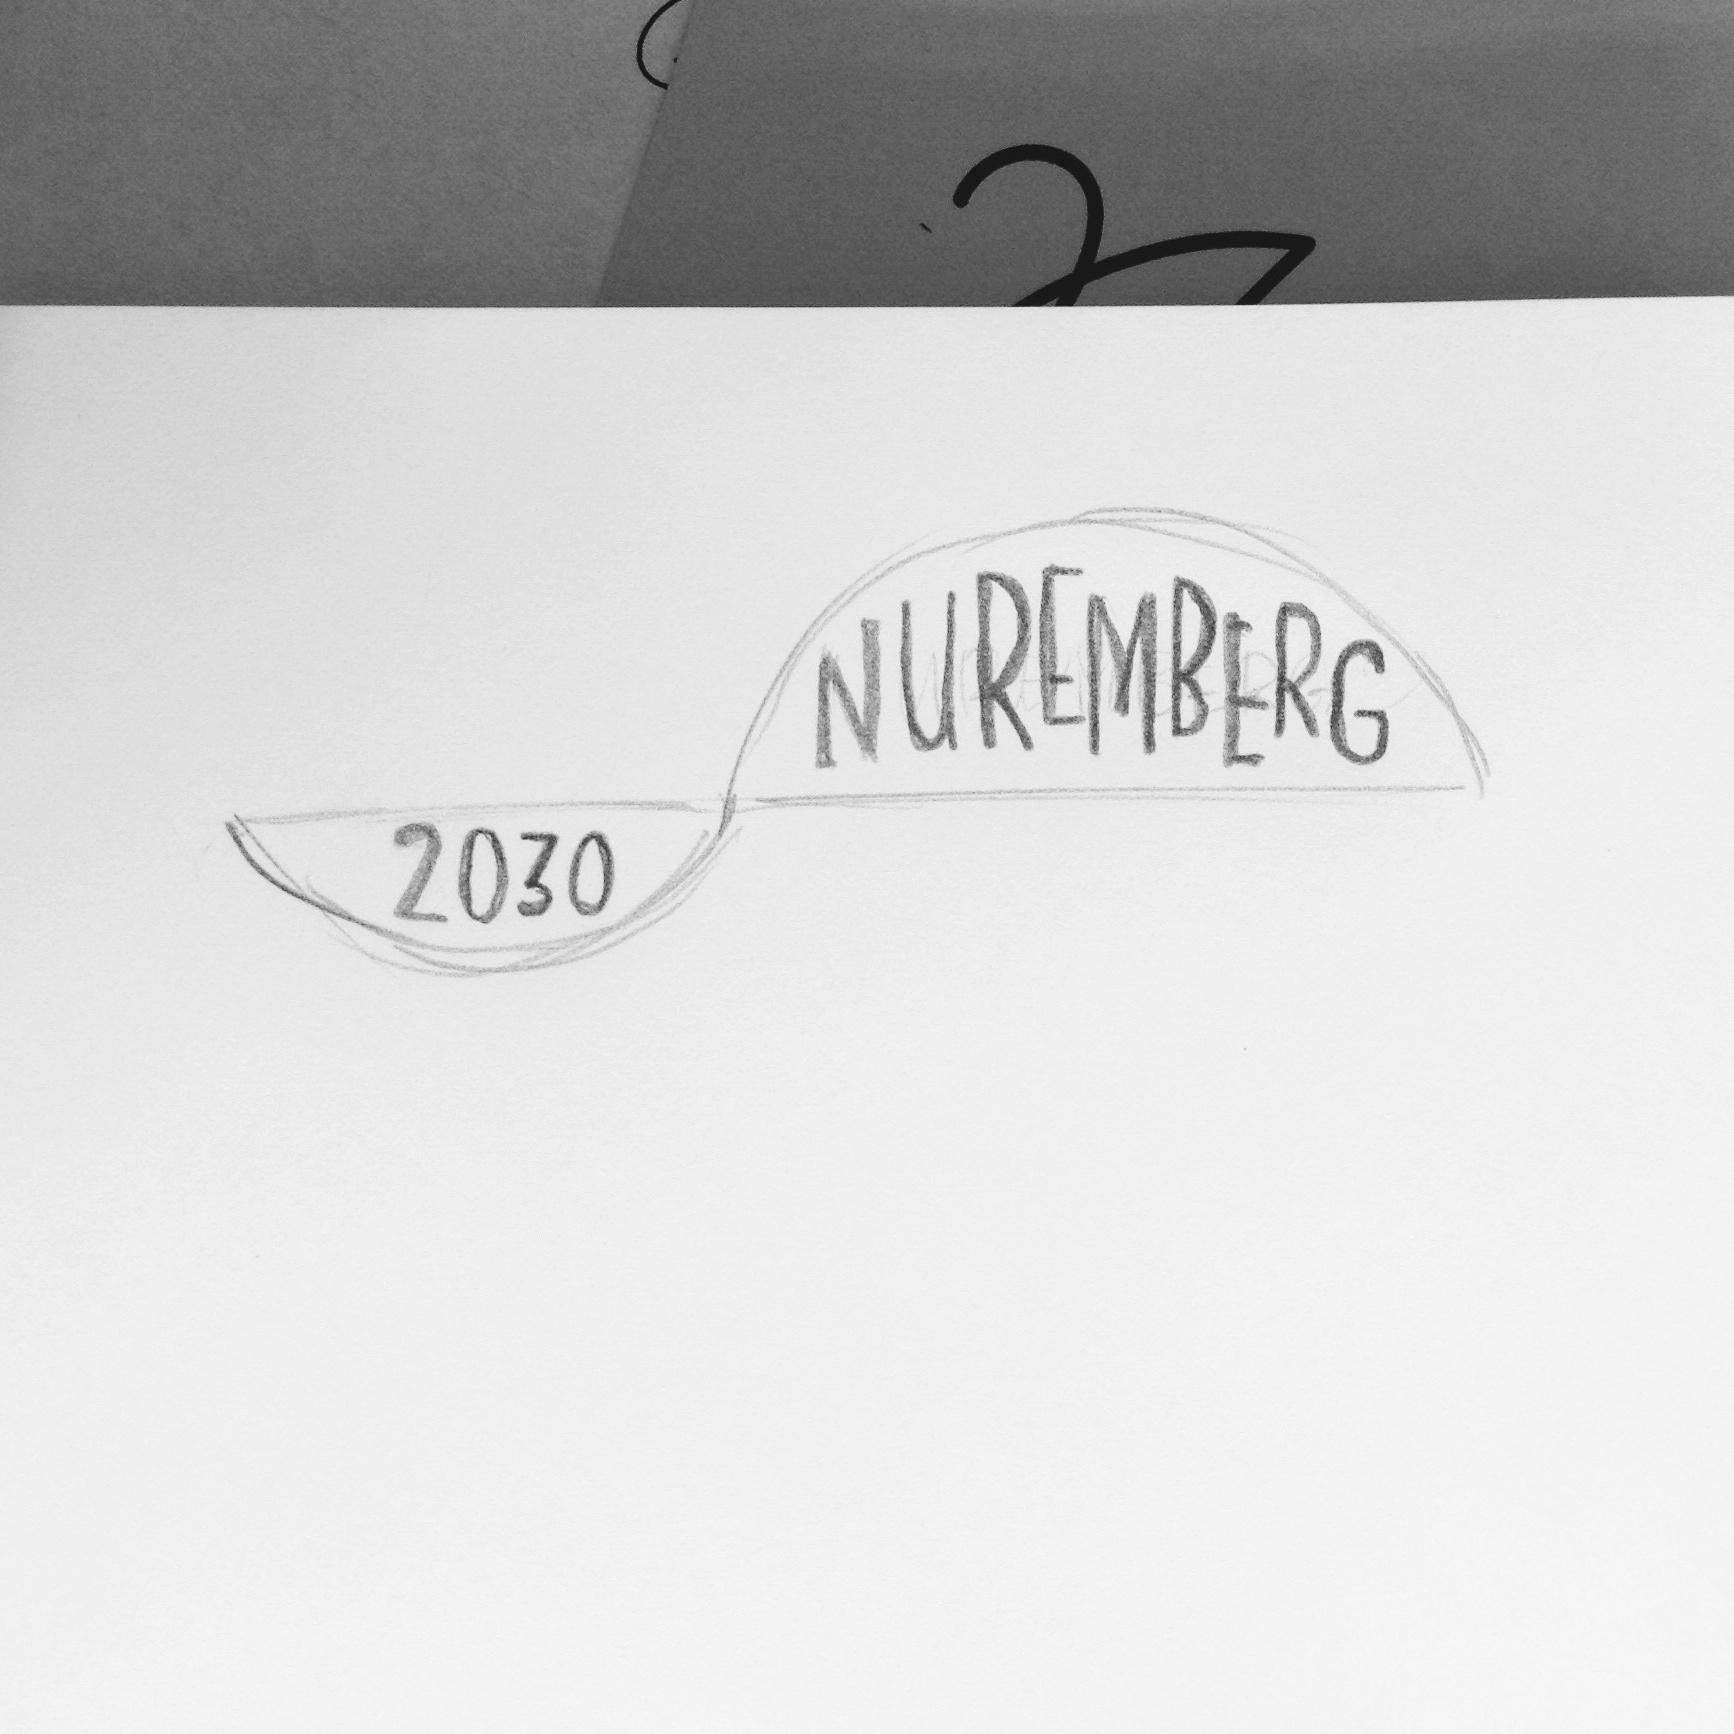 Nuremberg - image 7 - student project